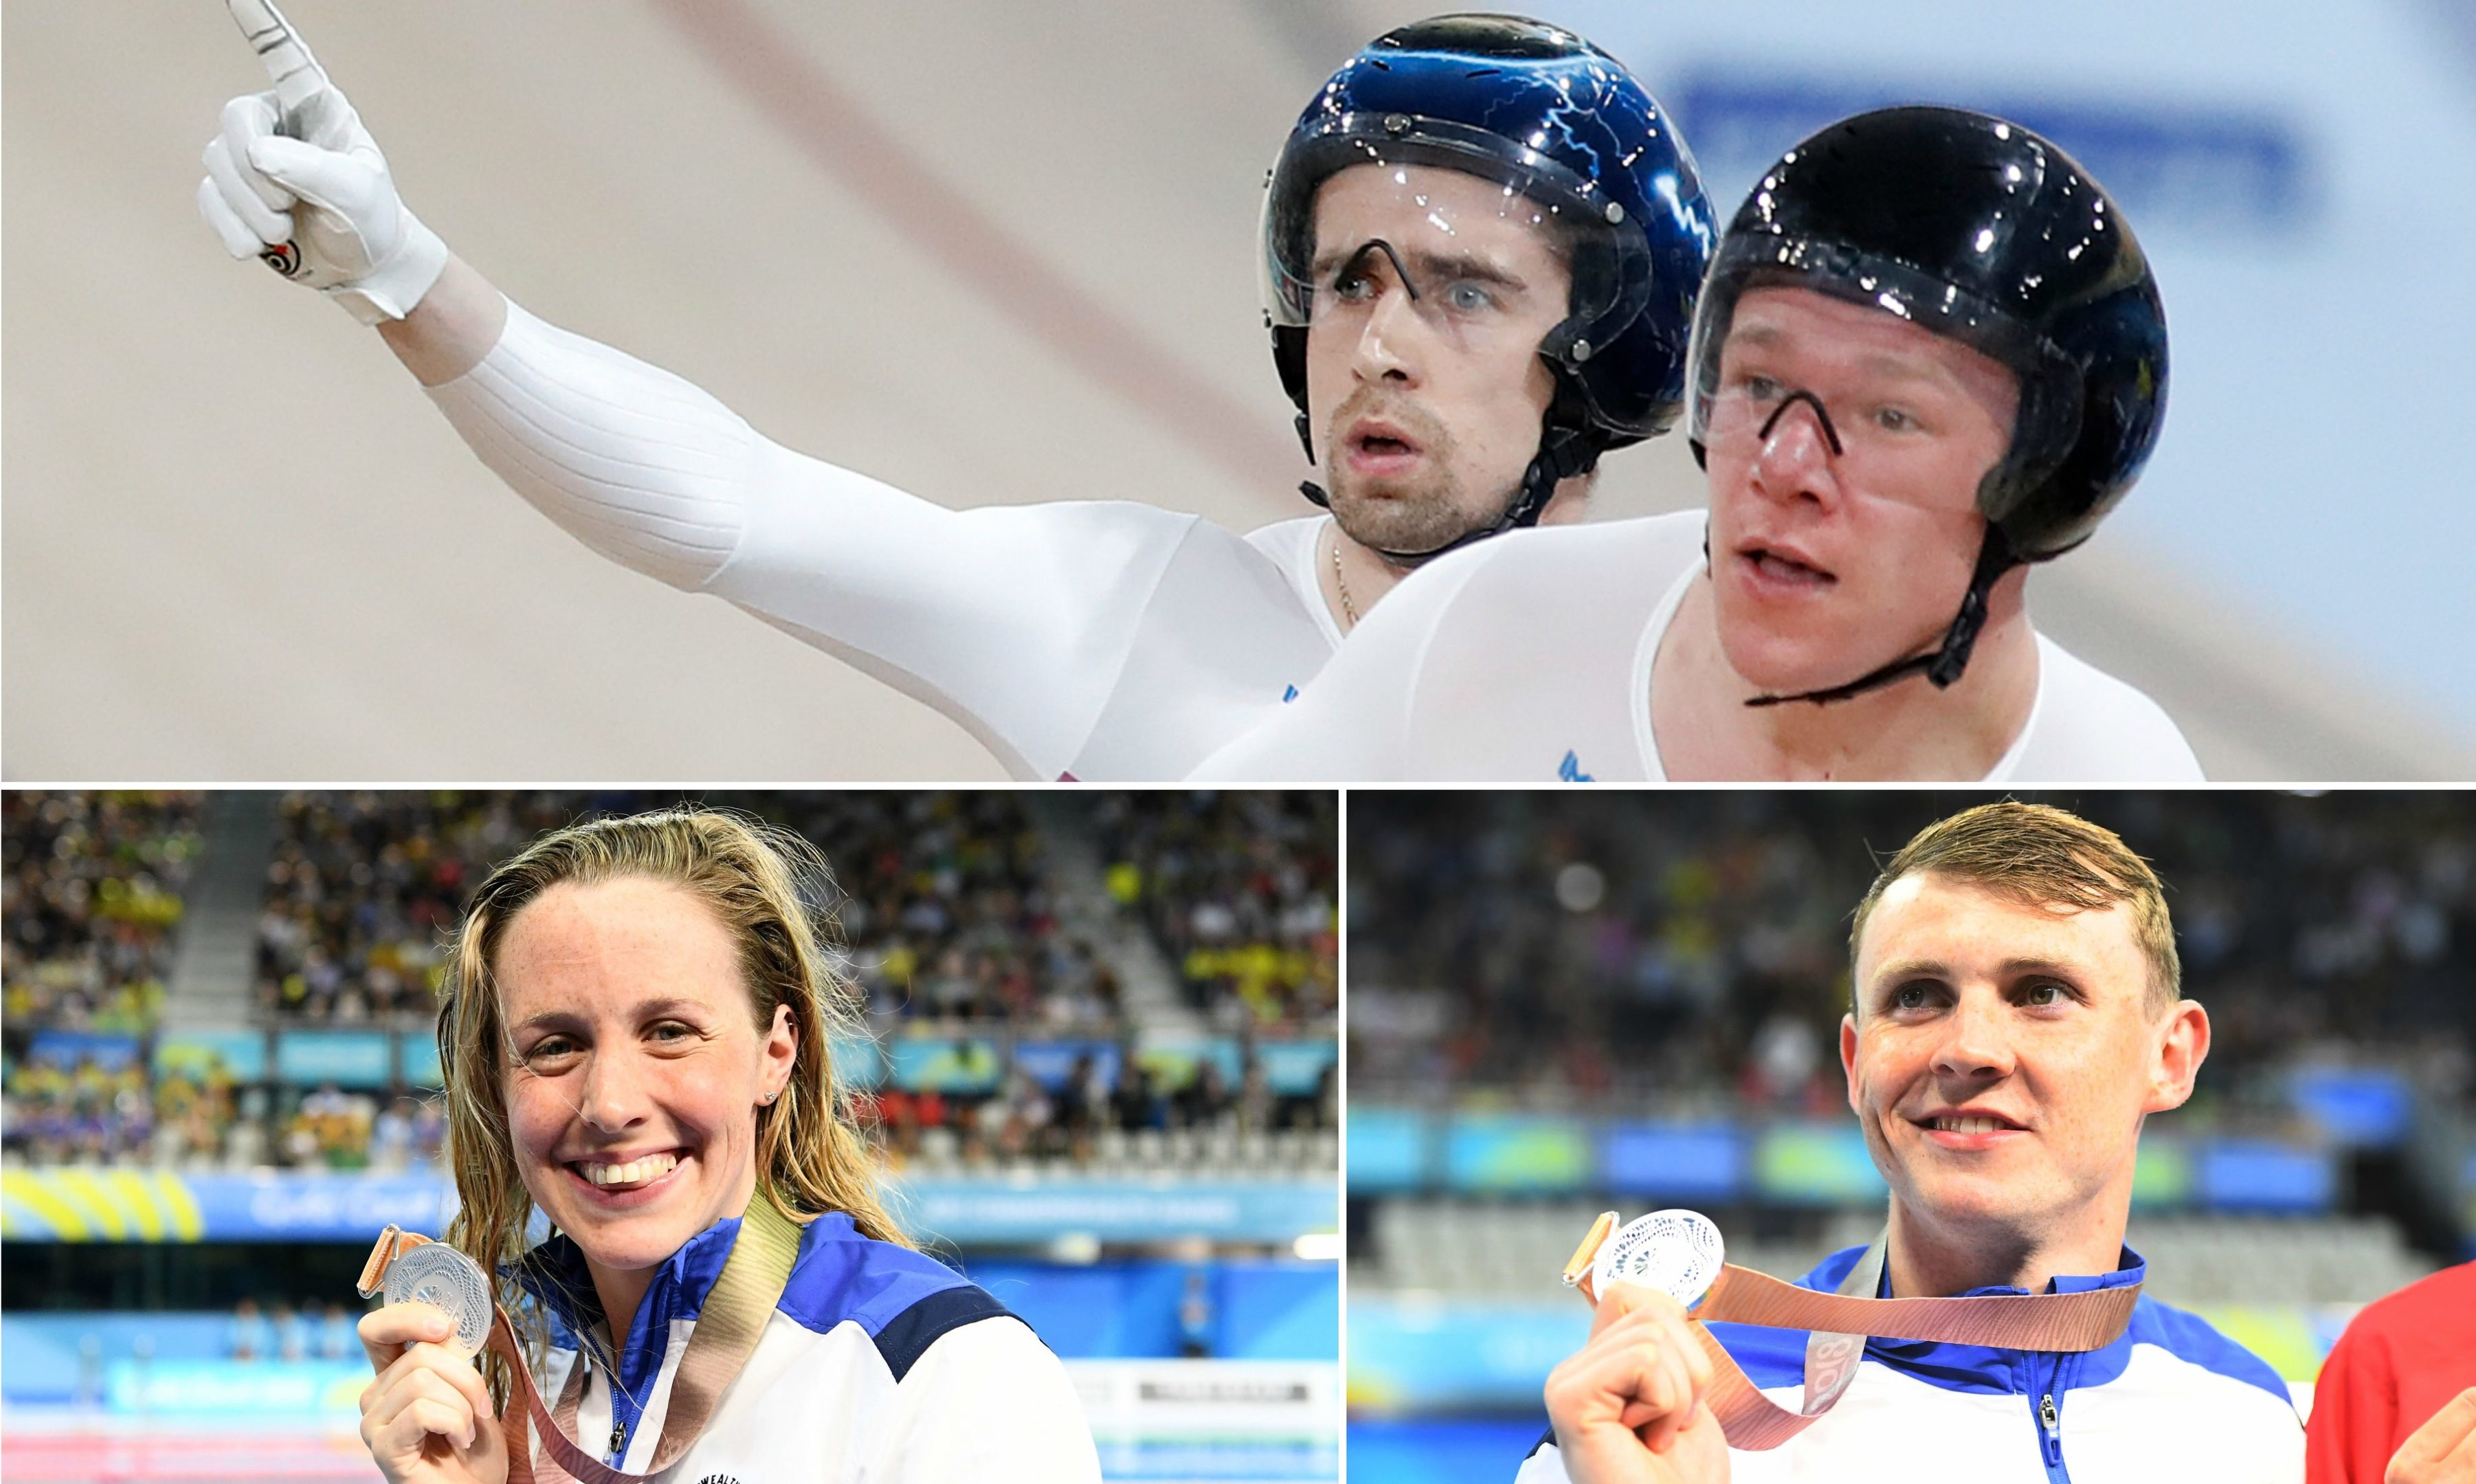 Scotland's Commonwealth Games 2018 medal winners Neil Fachie, Matt Rotherham, Hannah Miley and Ross Murdoch.